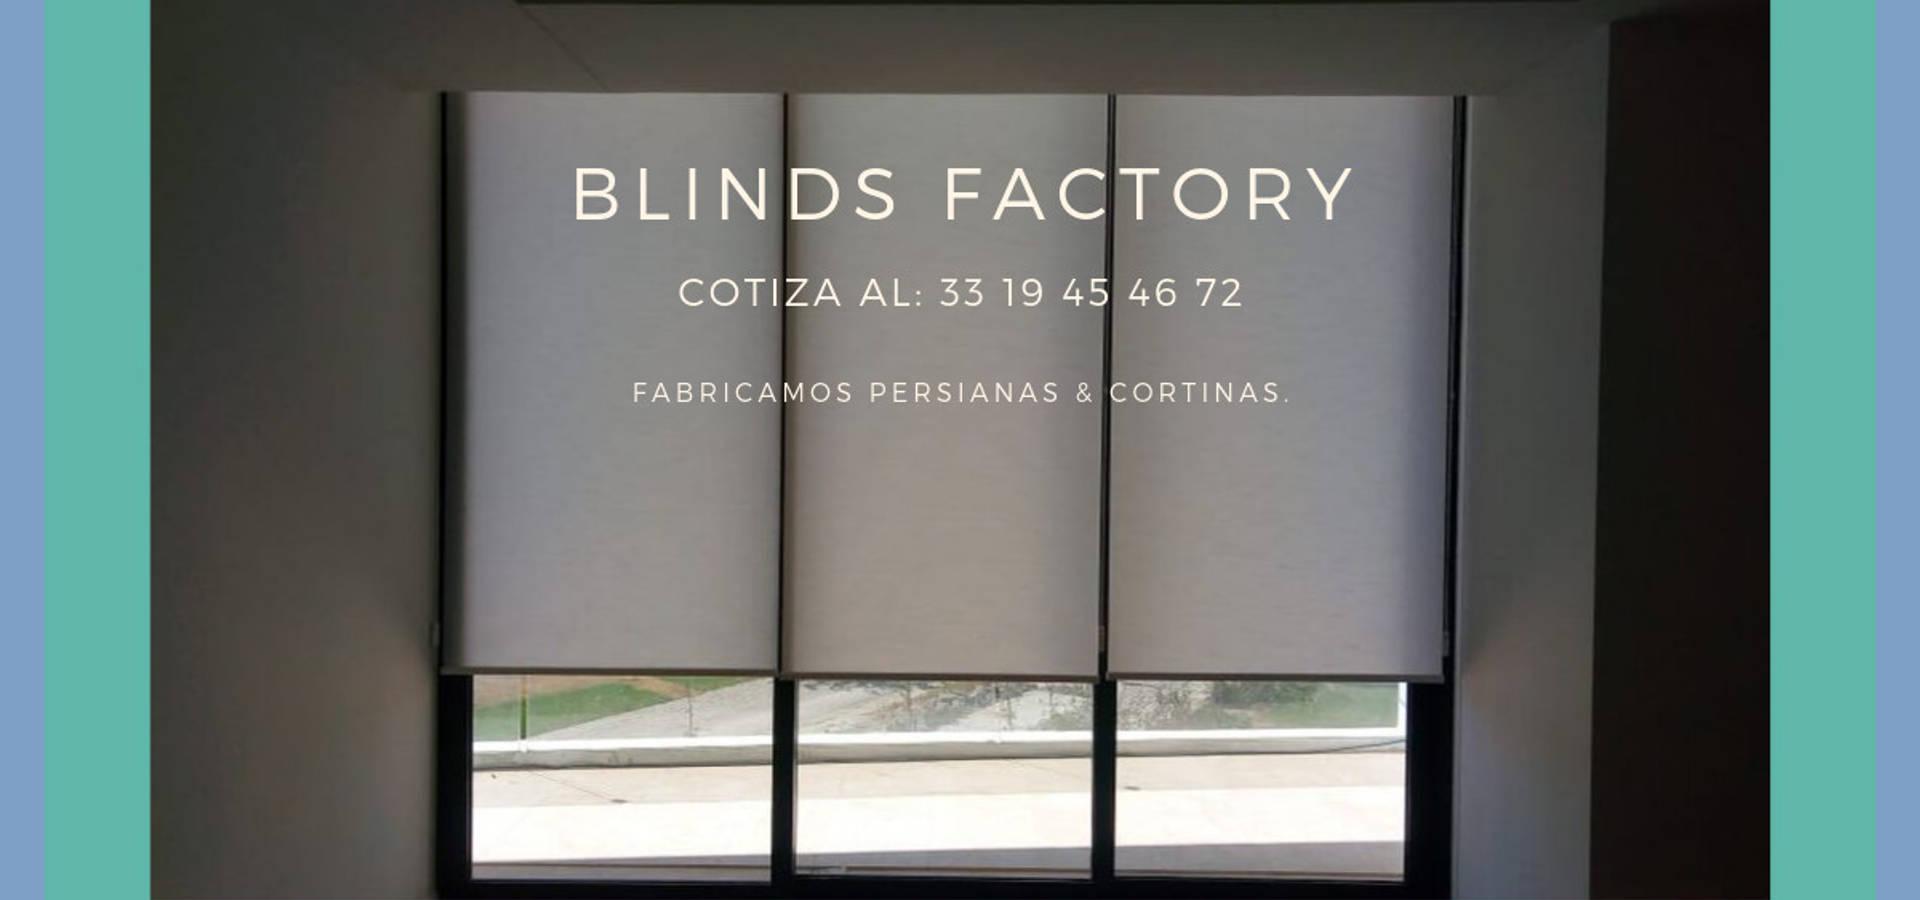 Blinds Factory GDL